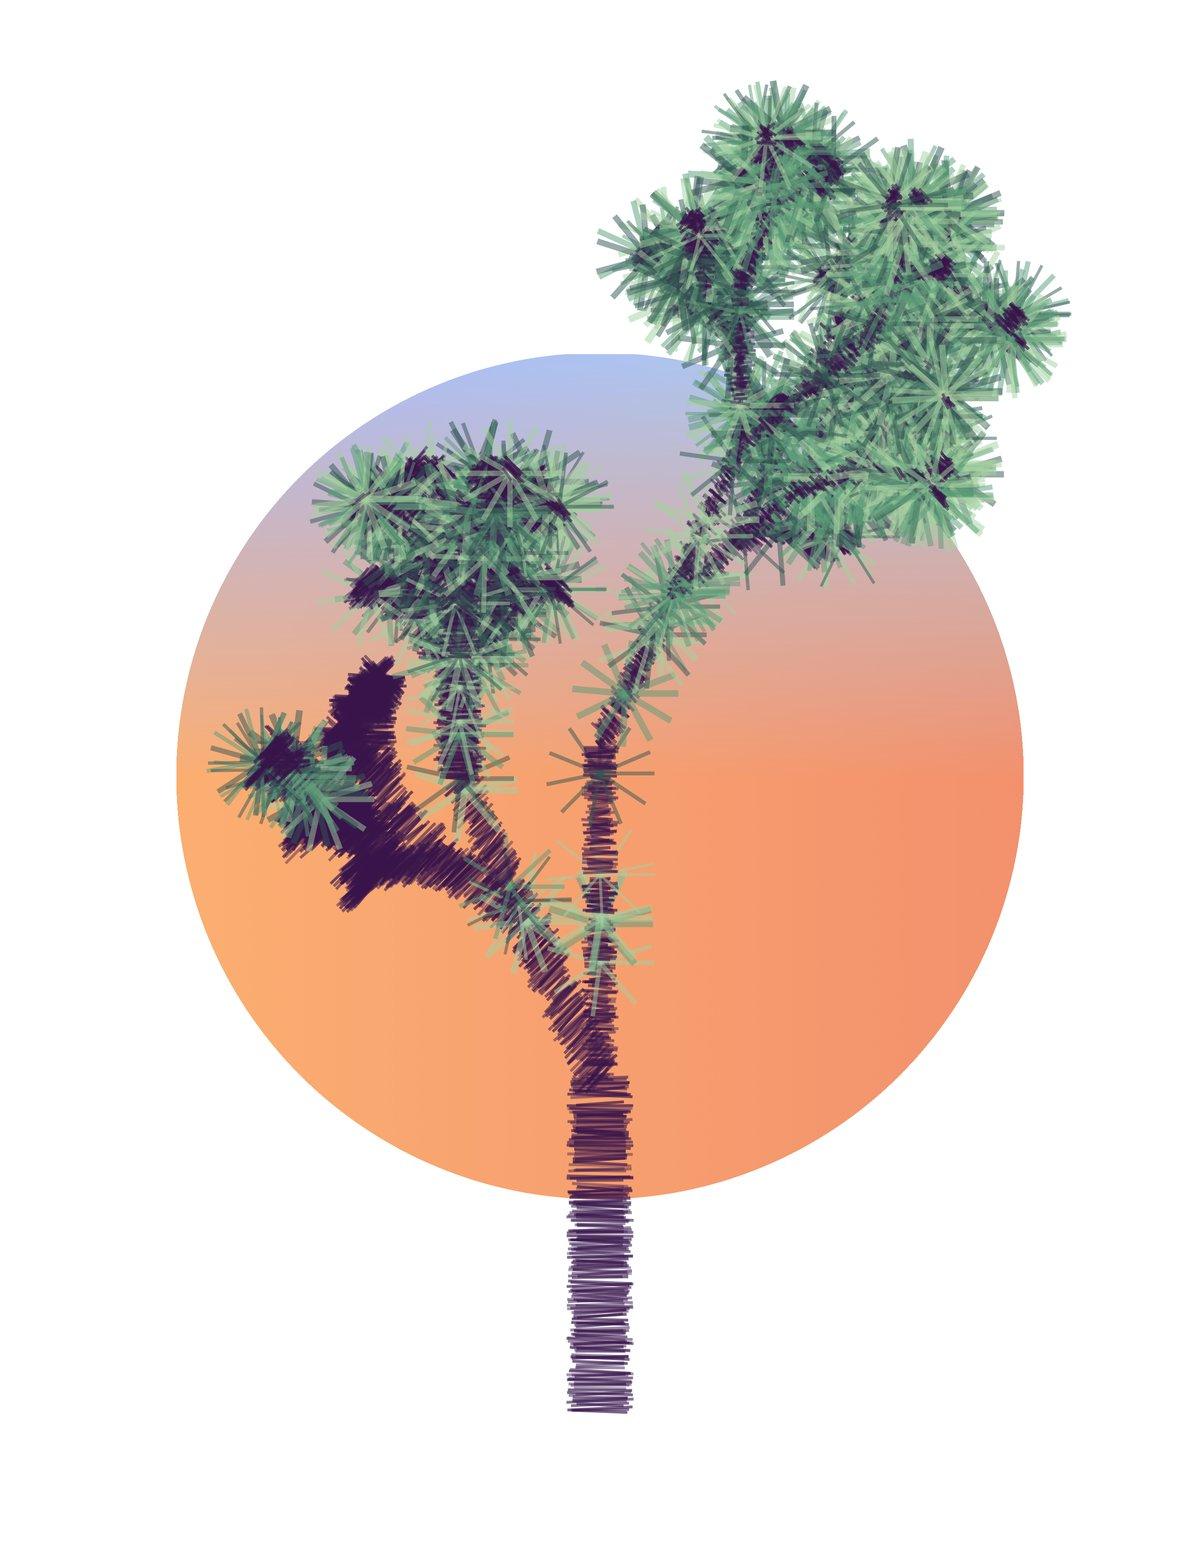 Image of Joshua Tree